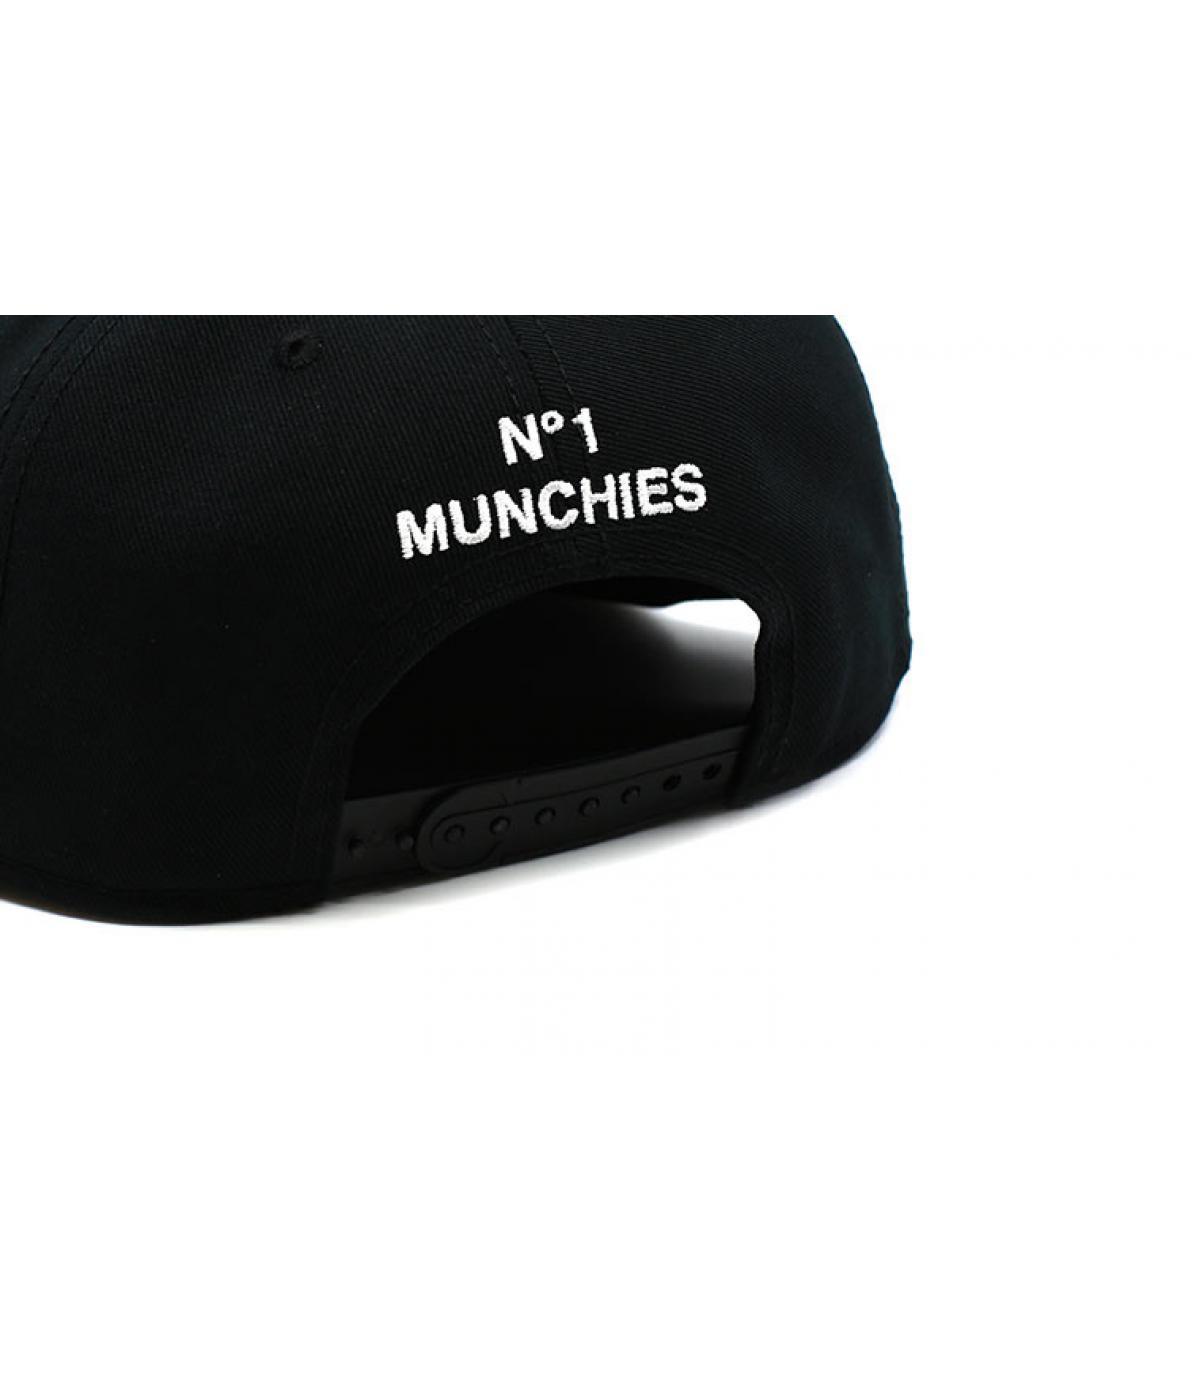 Detalles Munchel Snapback black imagen 4